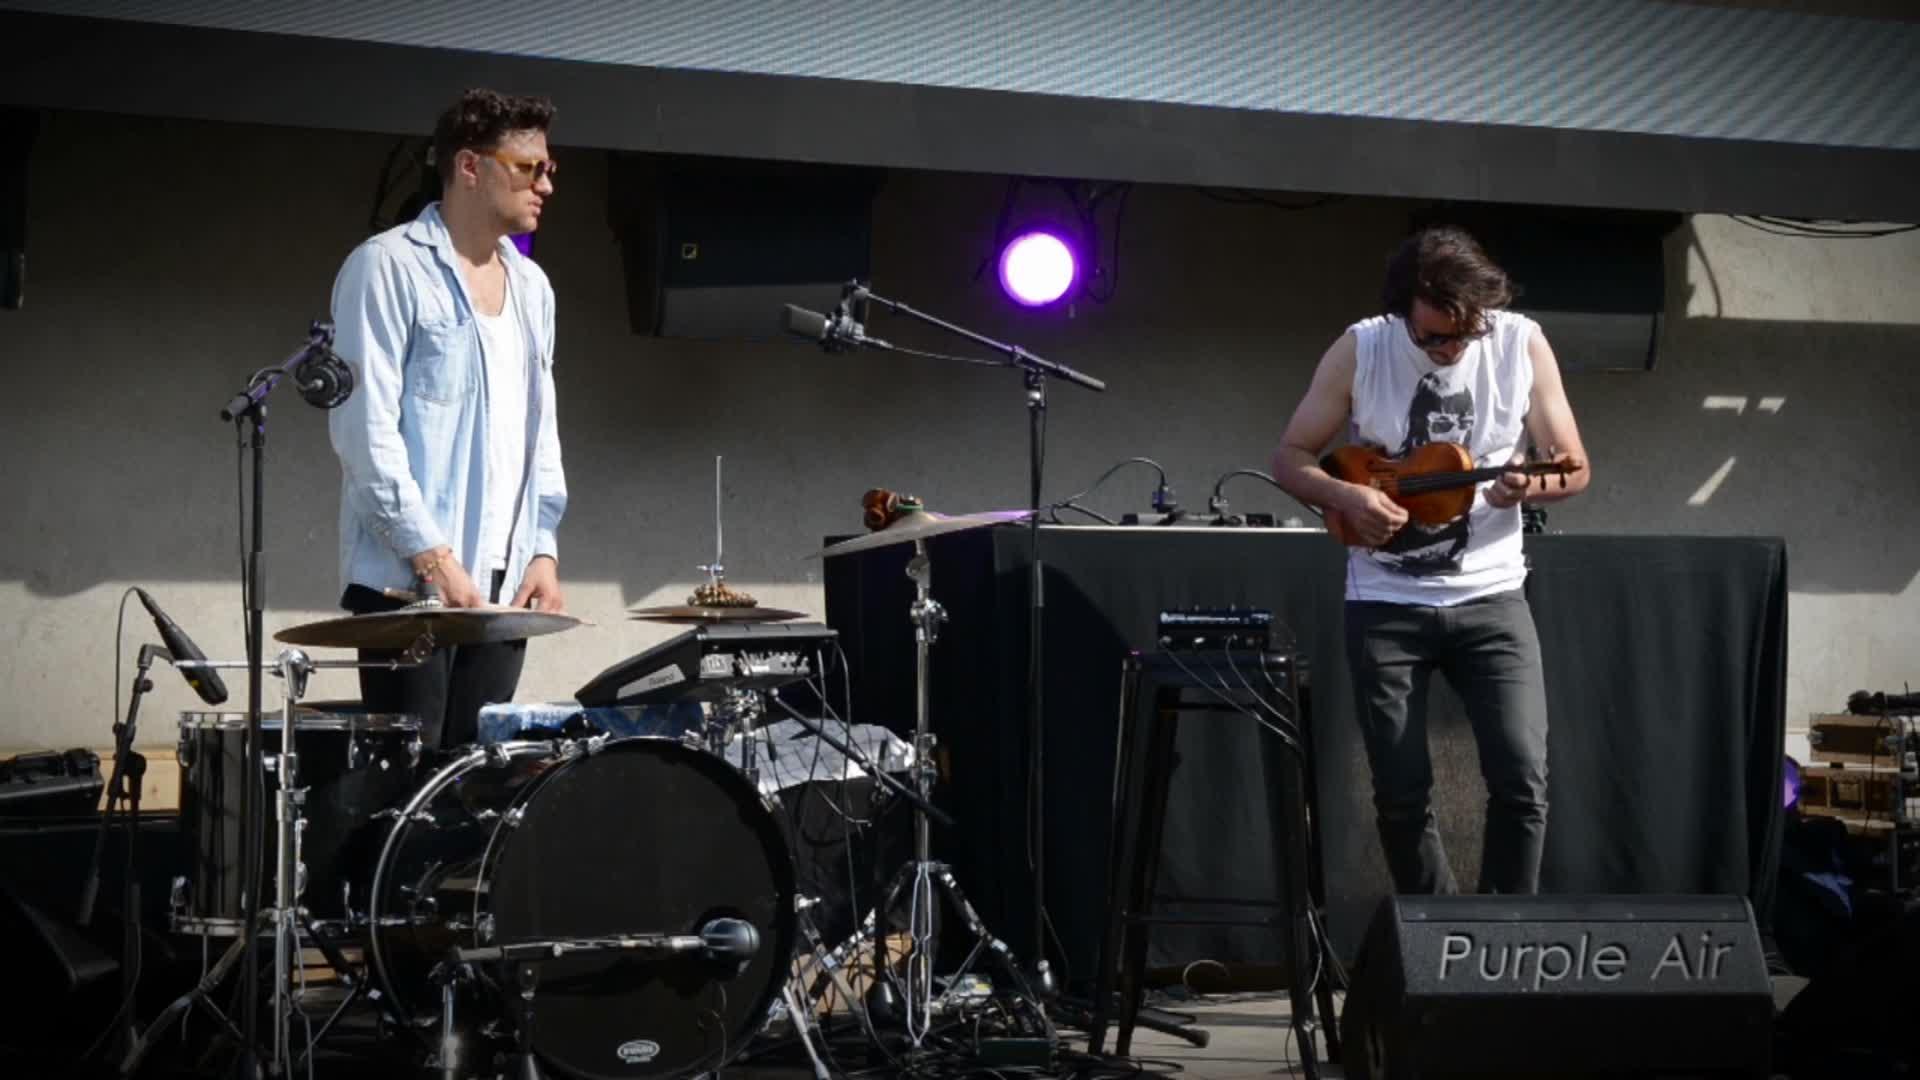 EgoPusher - Purple air